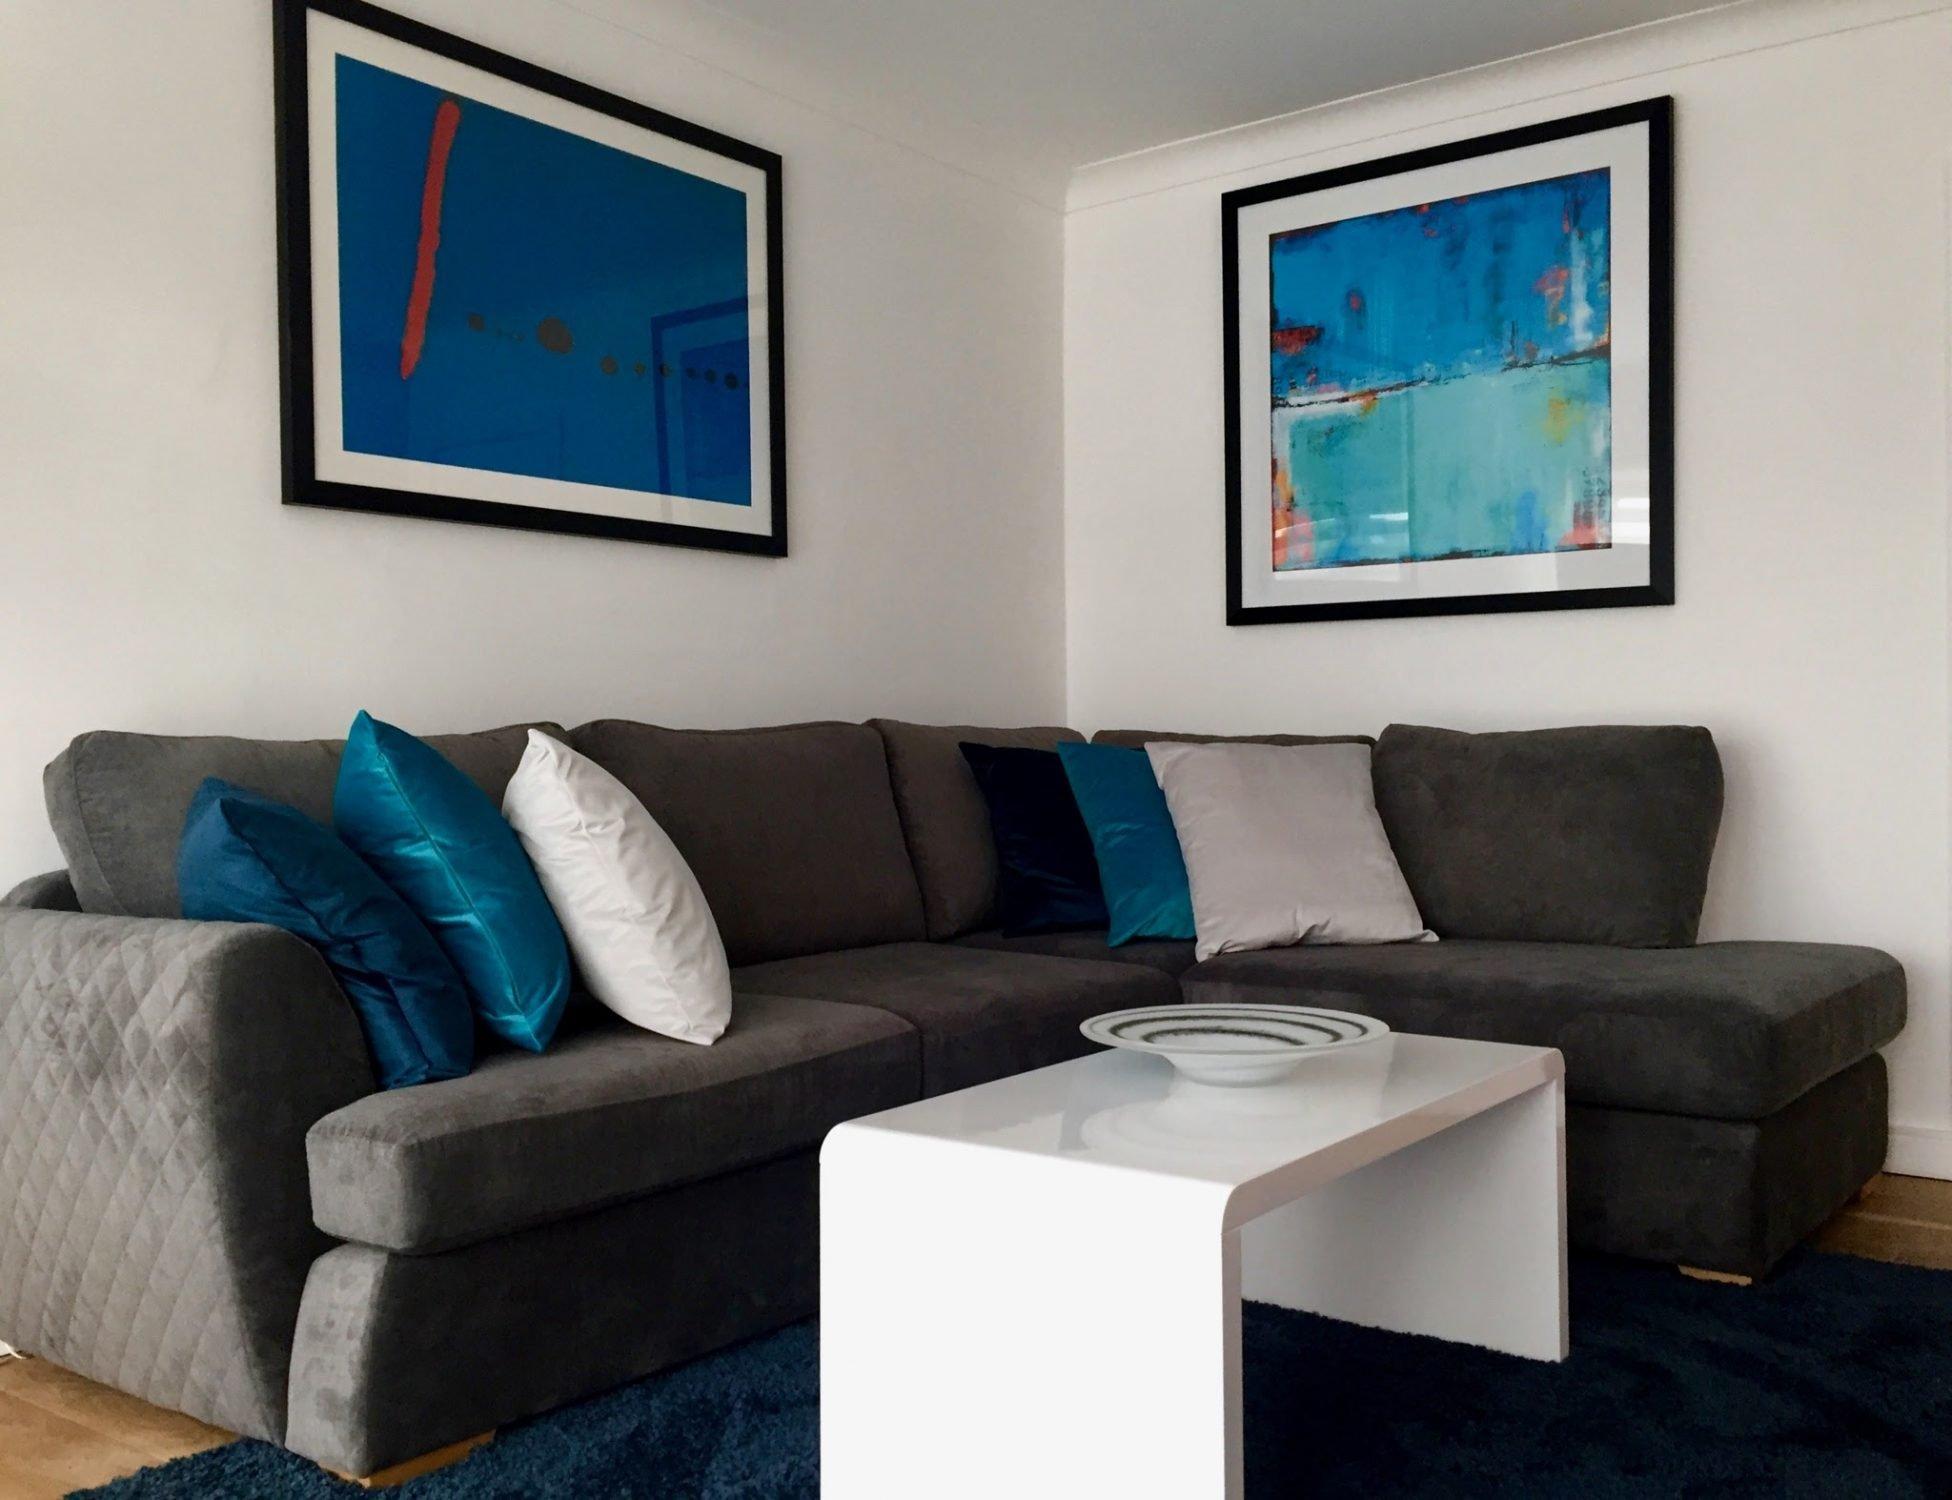 Accommodation rates Alderley Edge